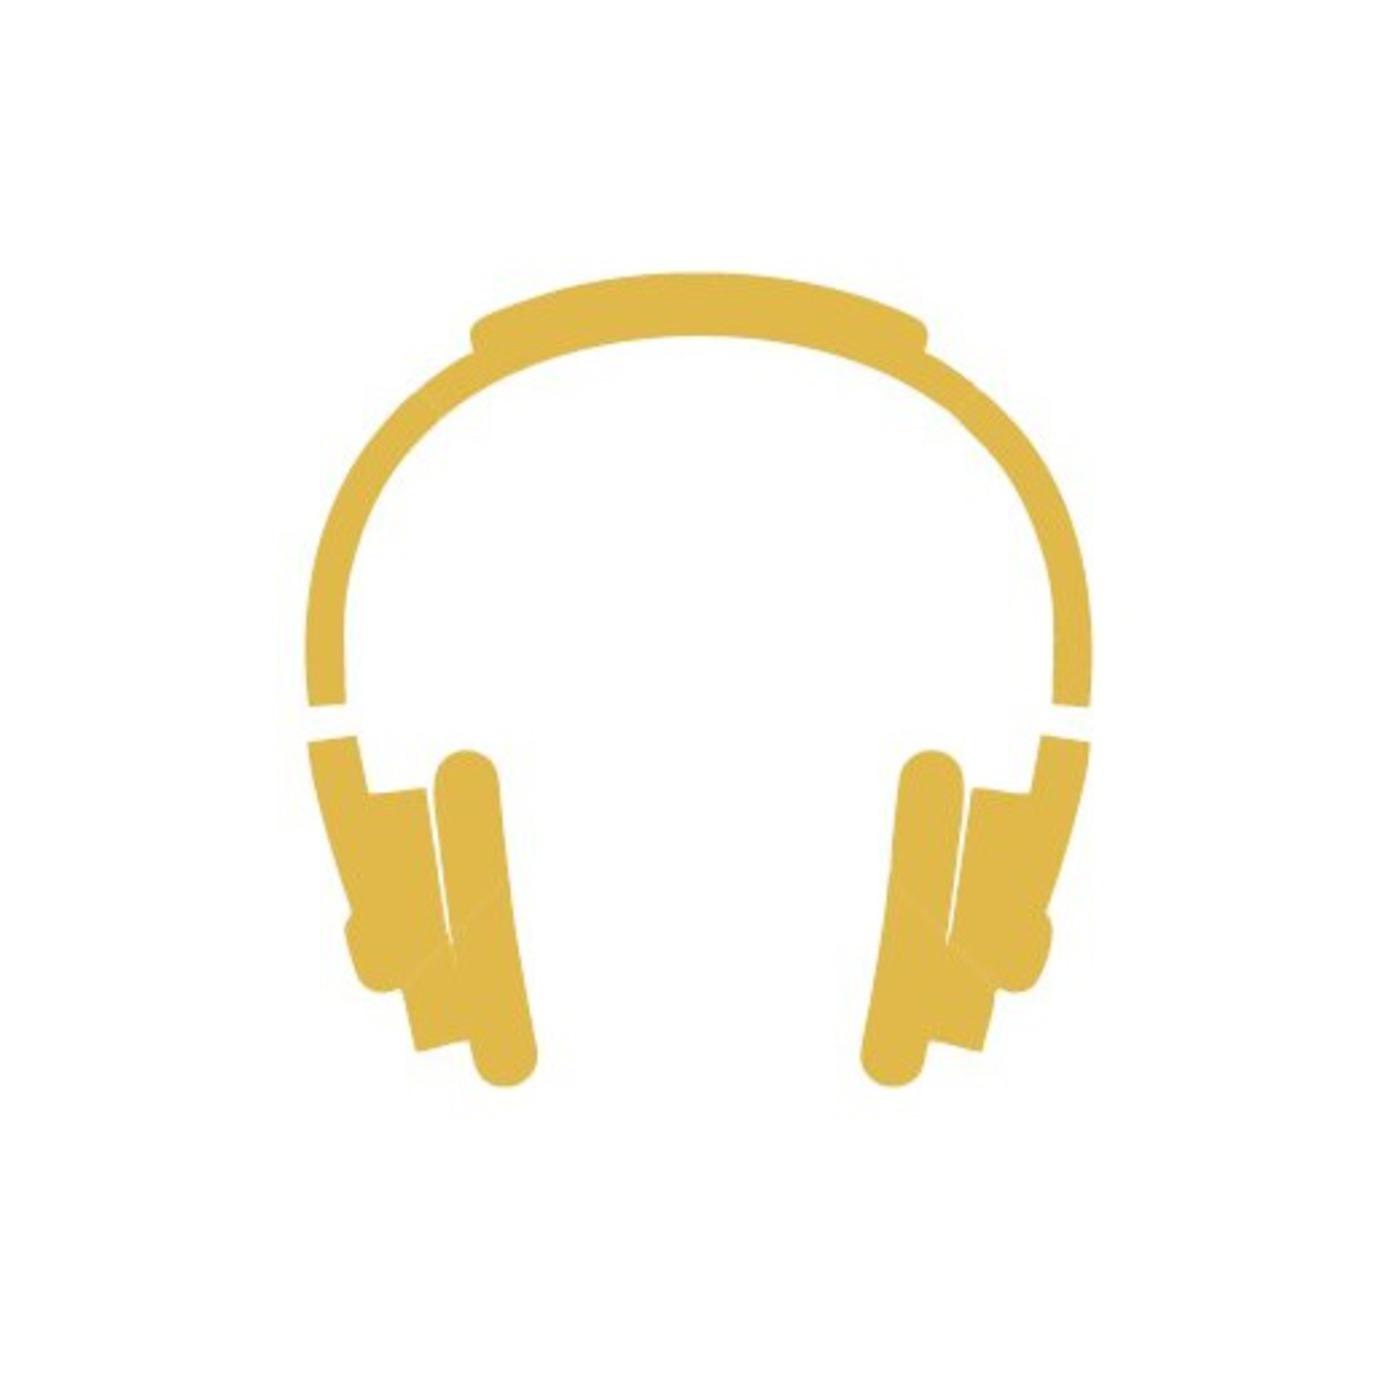 Chris Kaltsas' Podcast